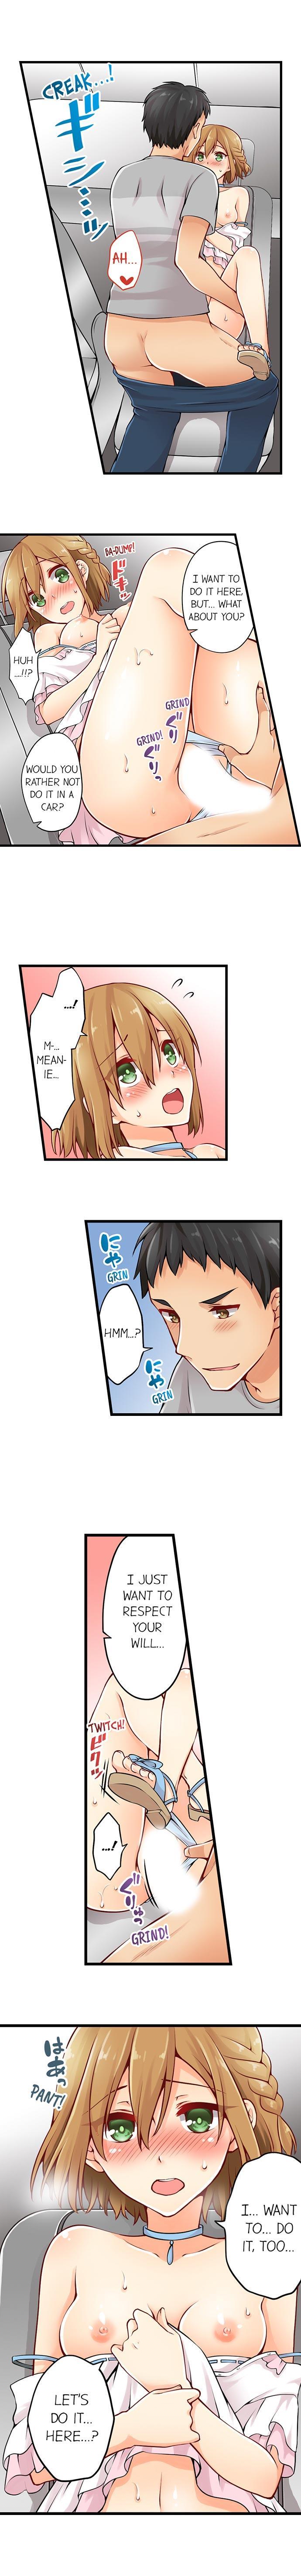 Ren Arisugawa Is Actually A Girl 133